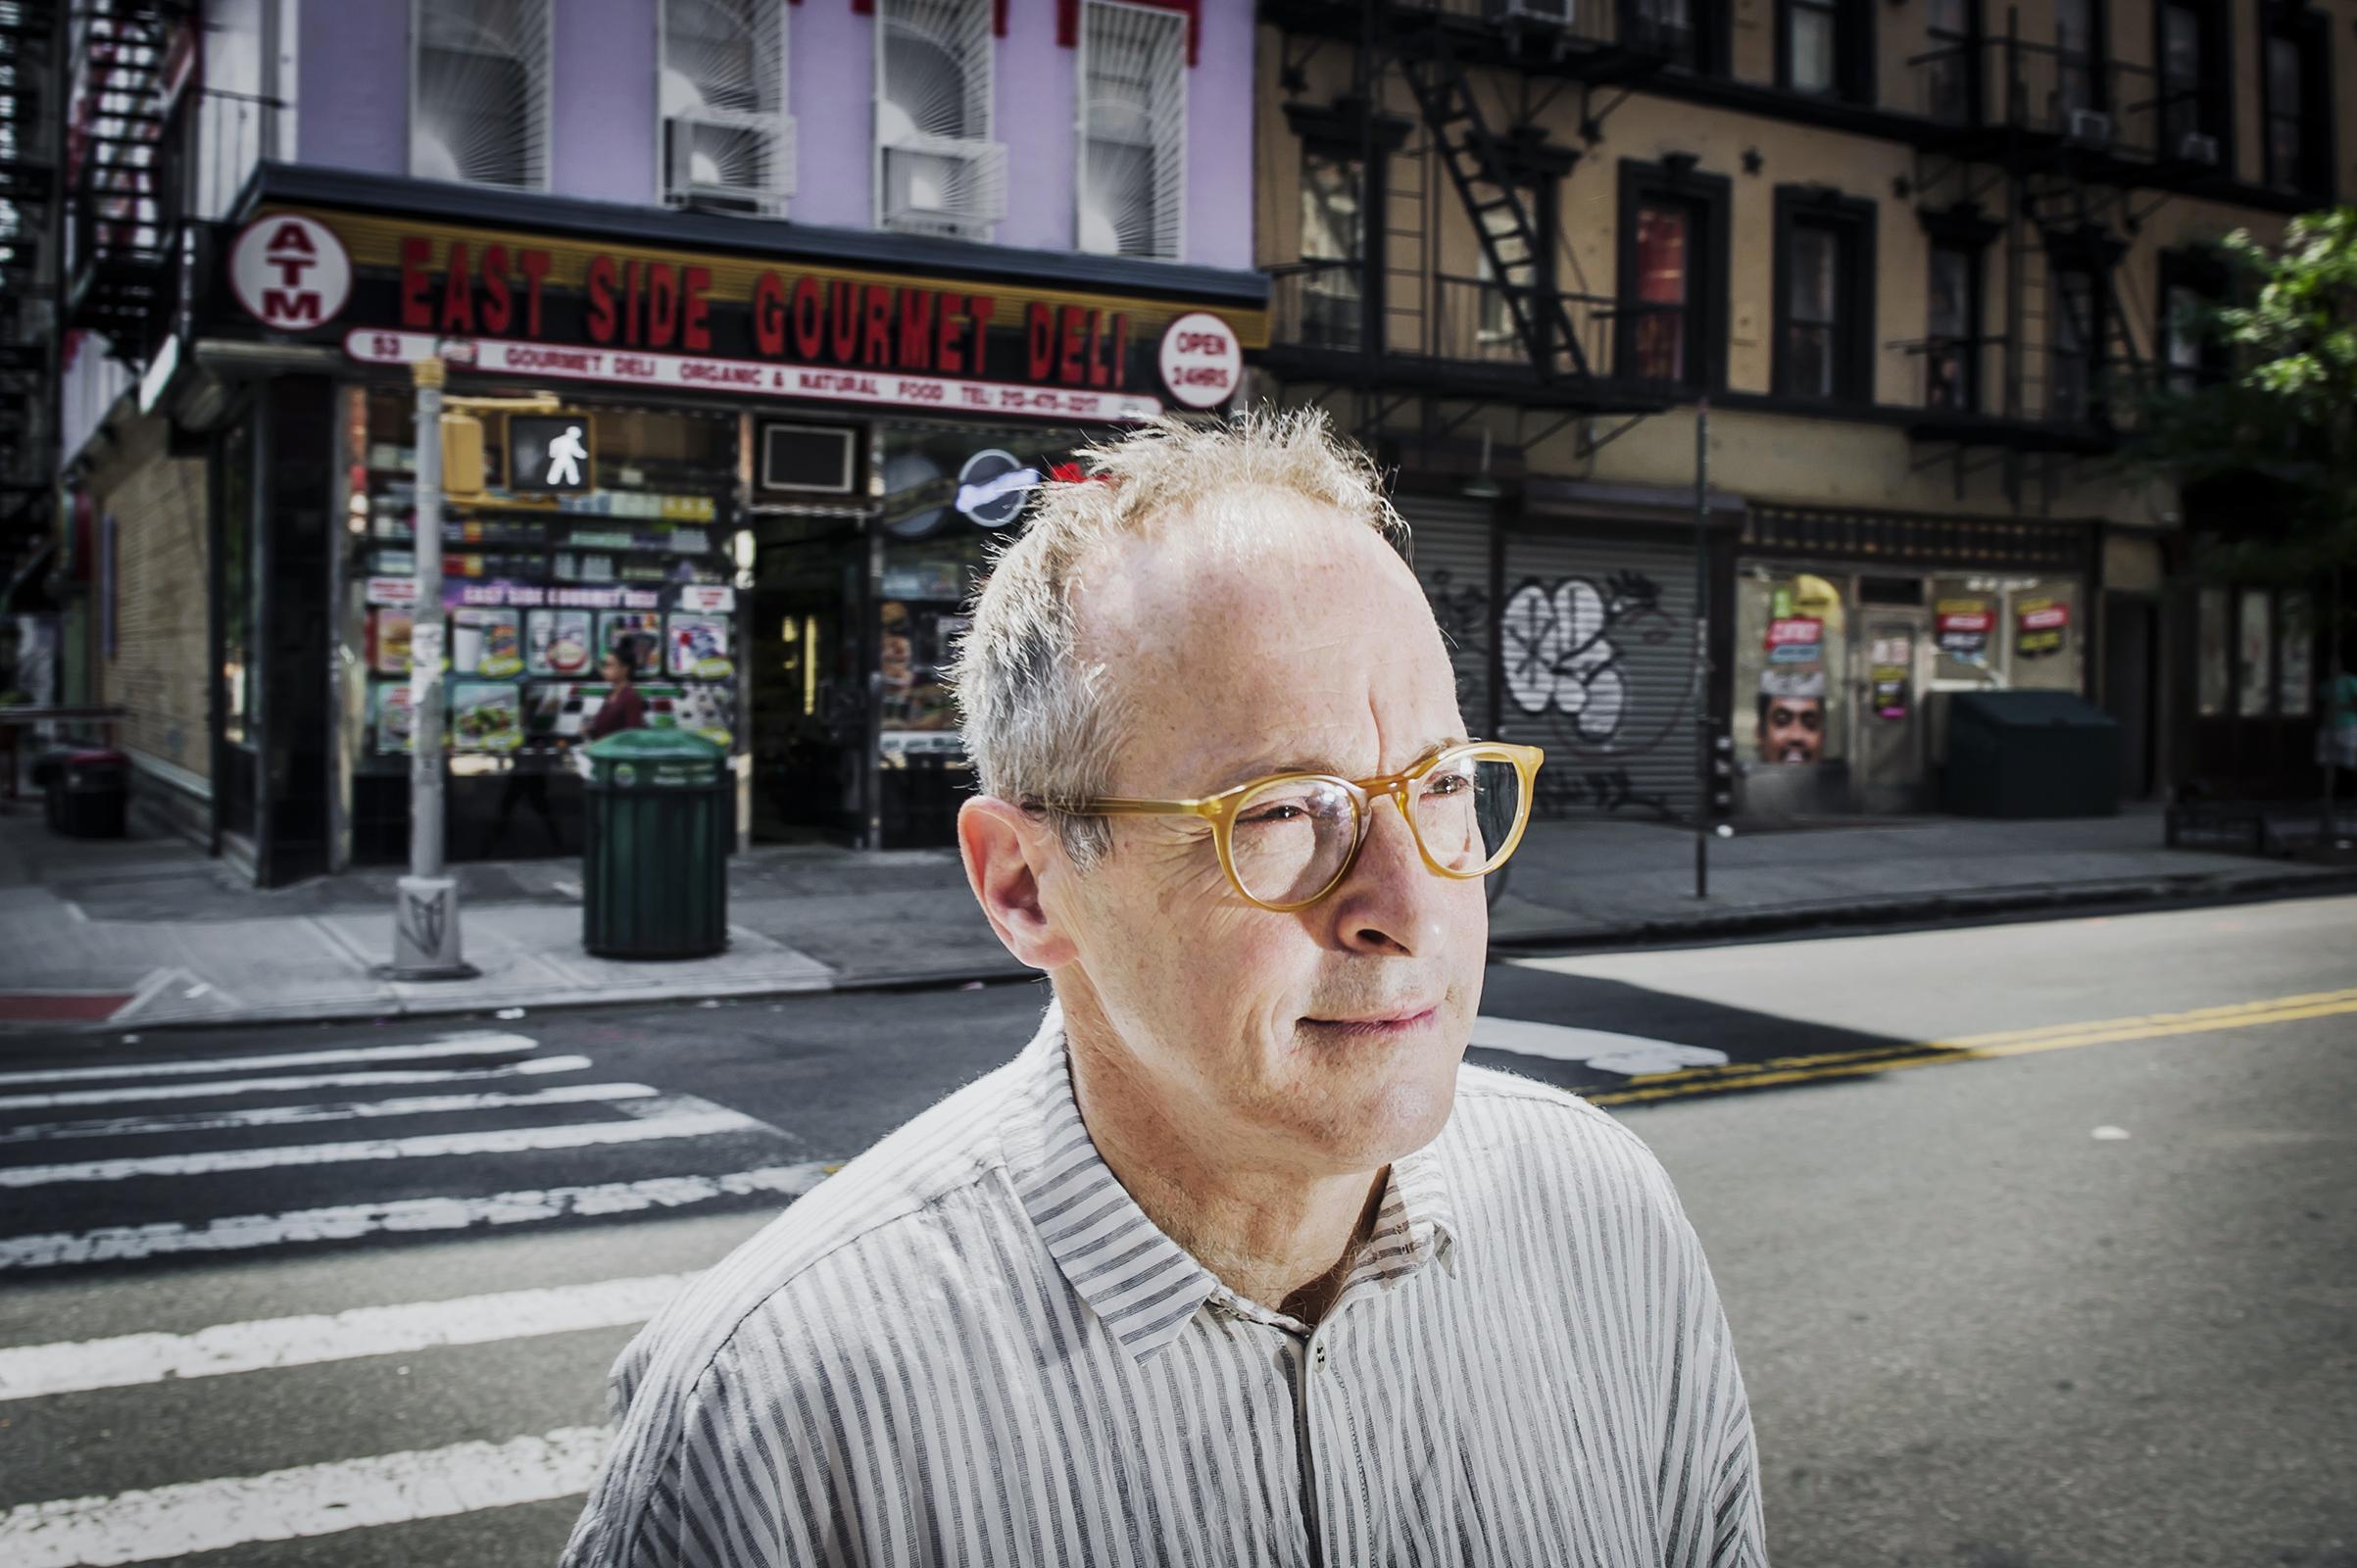 David Sedaris in the East Village of New York City on May 25, 2018.